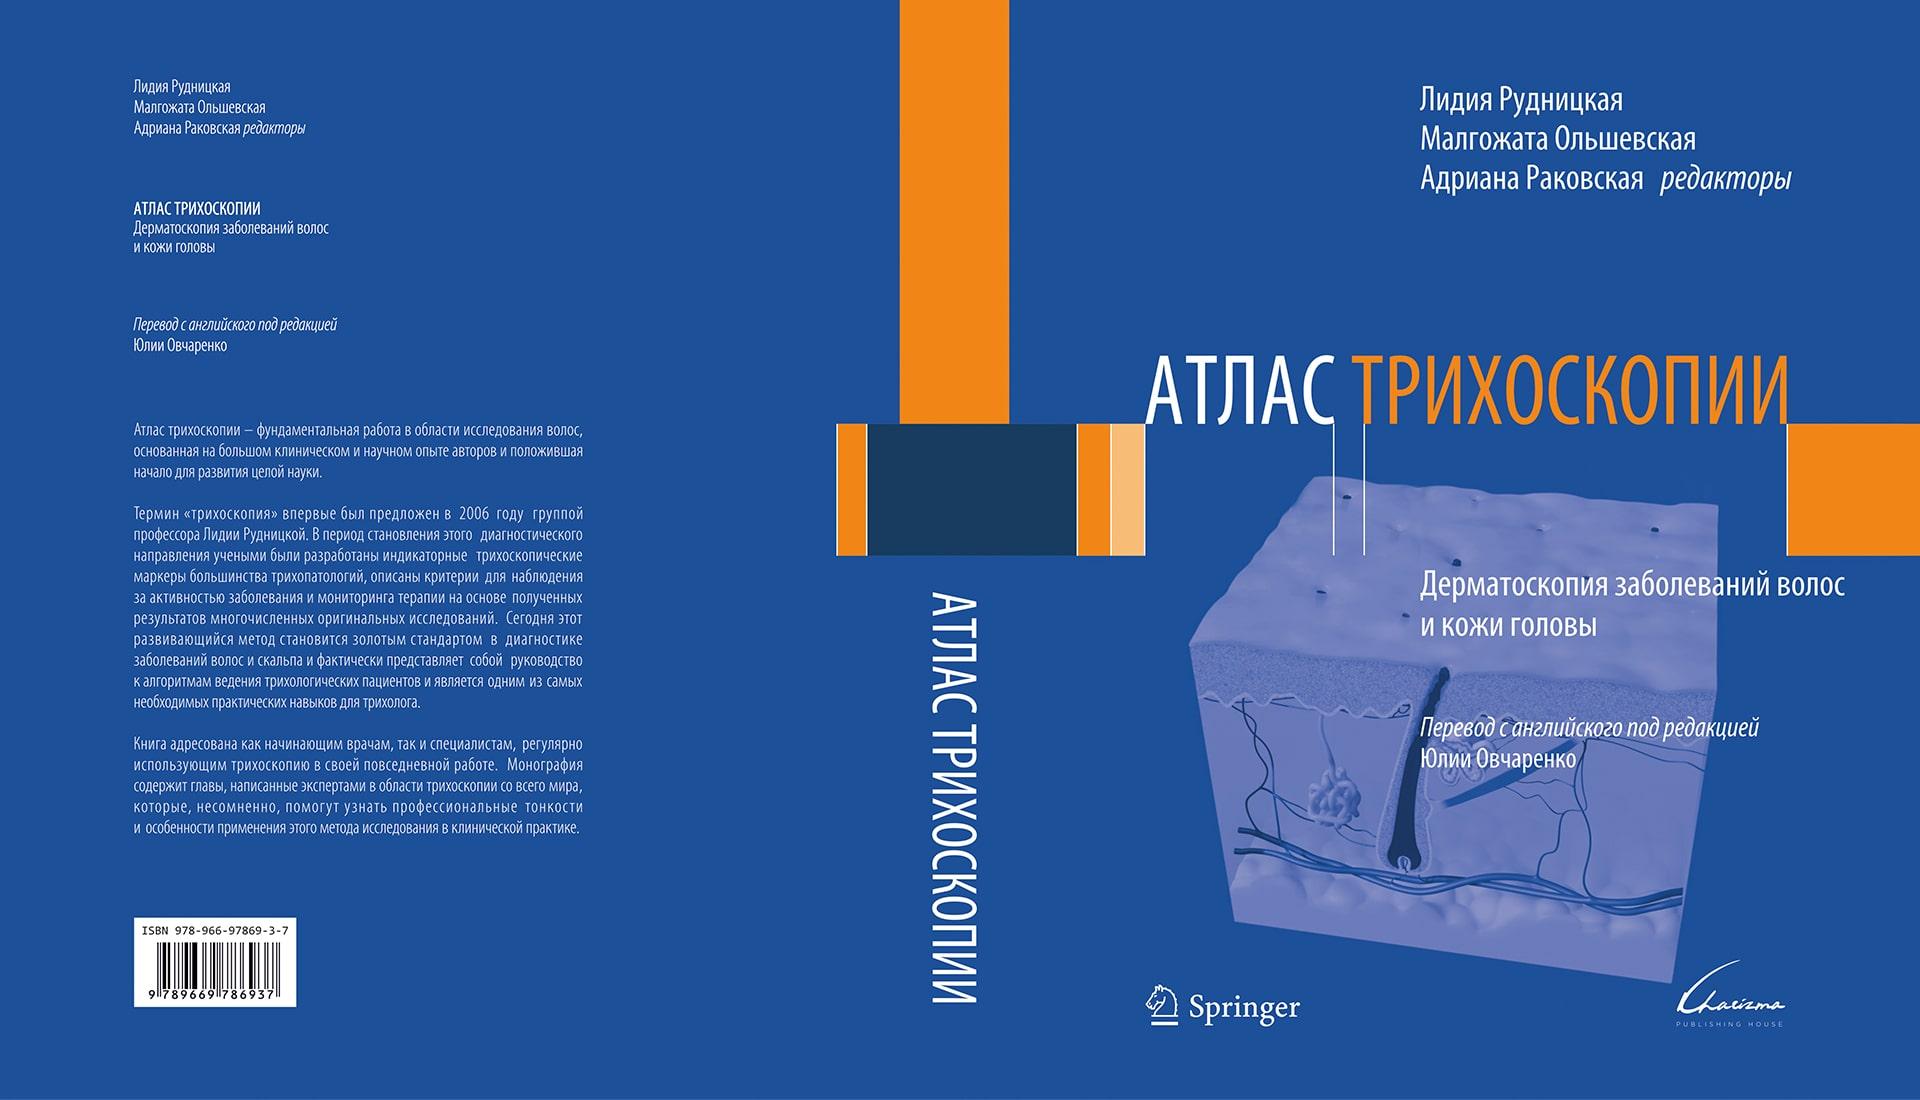 Атлас трихоскопии